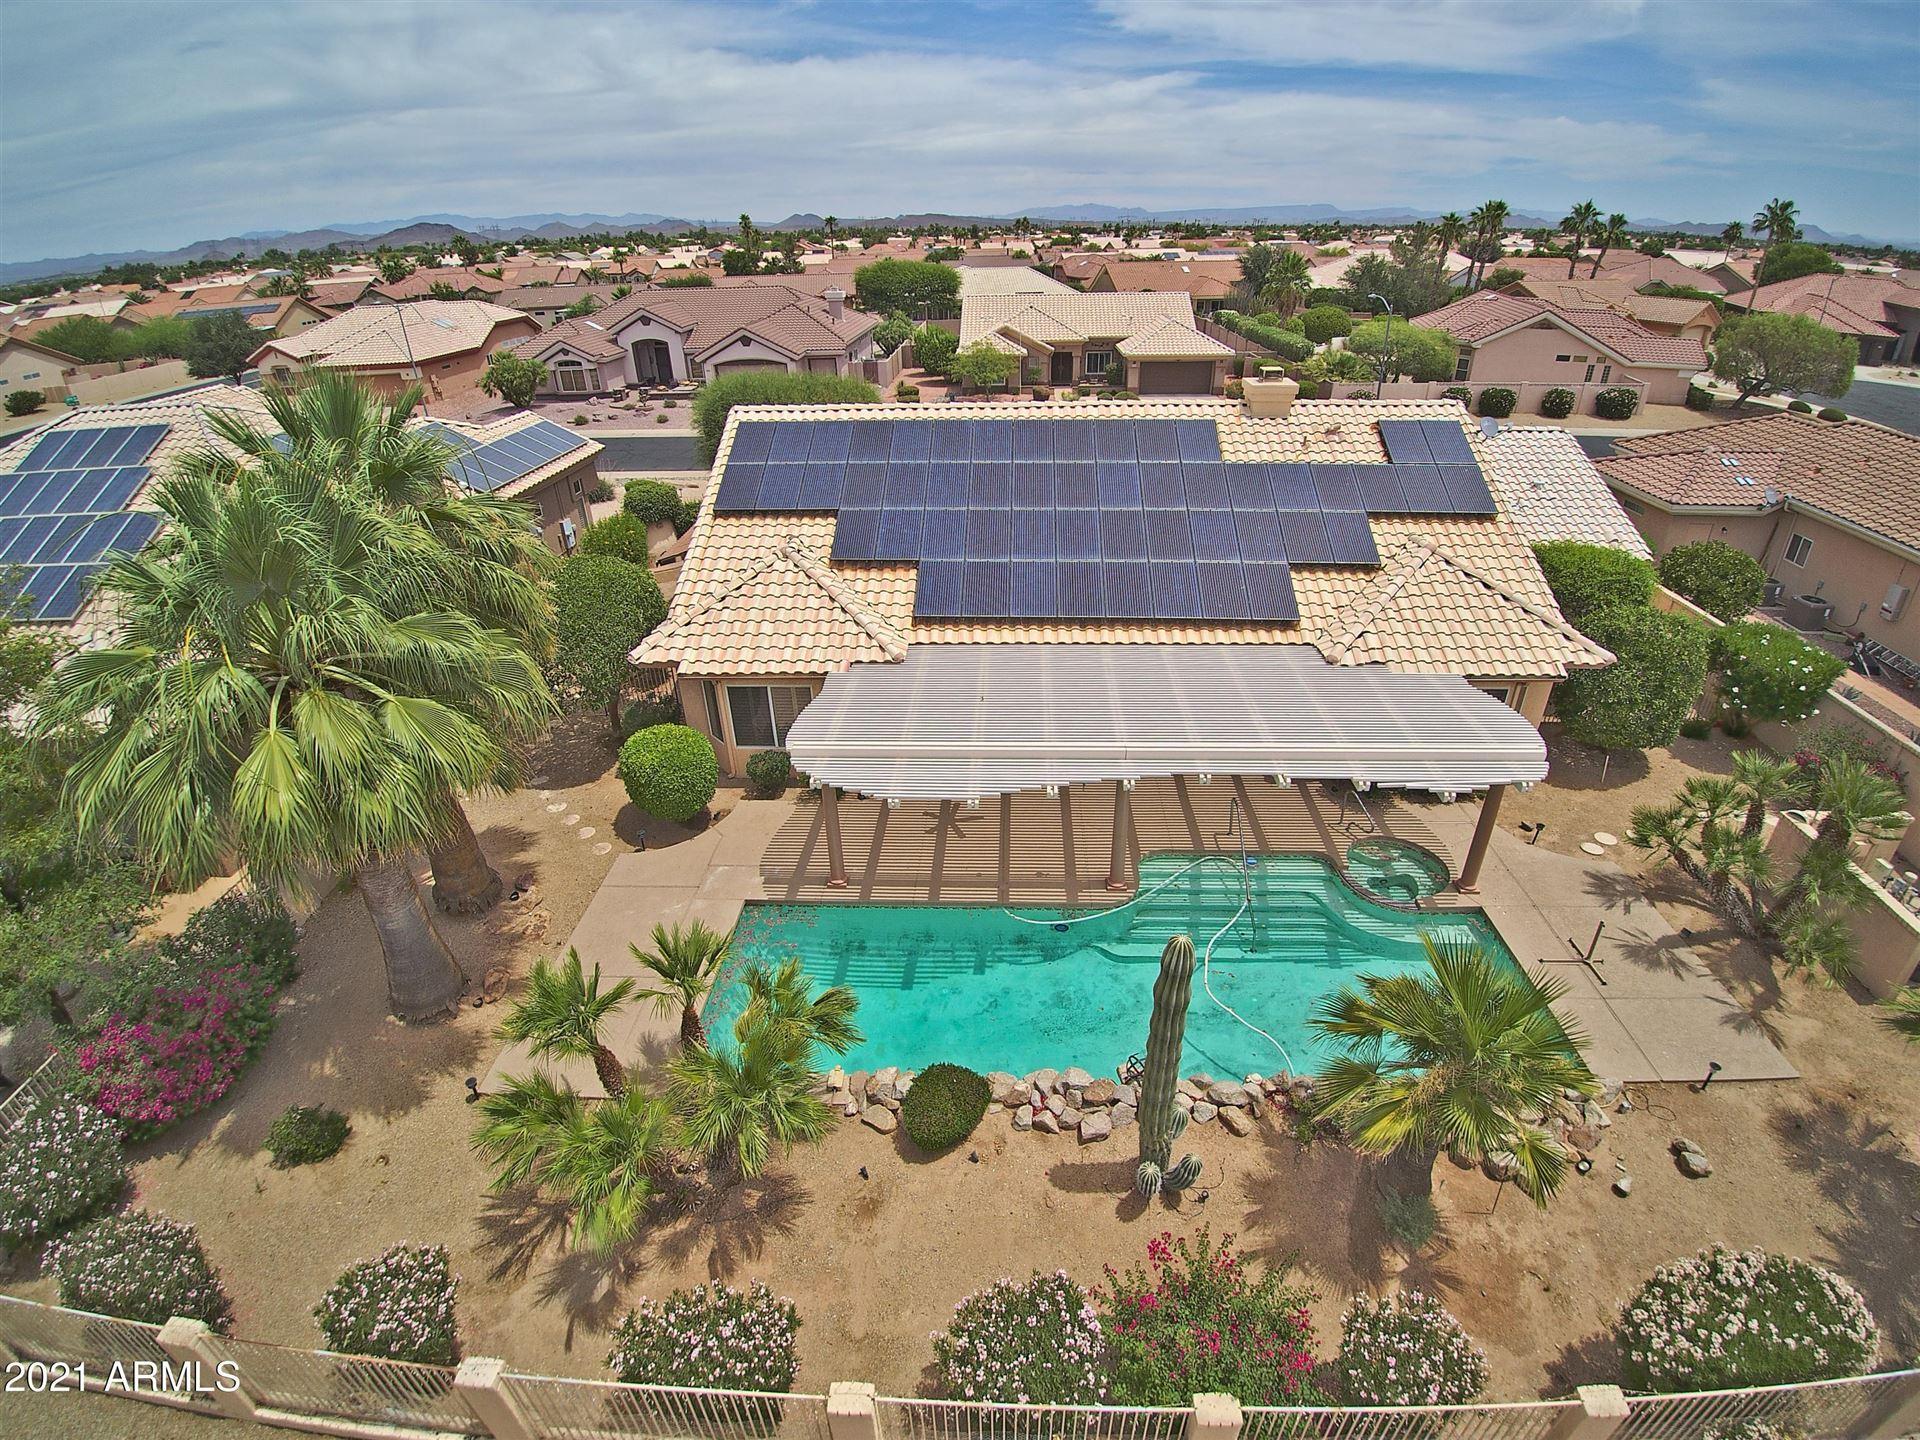 Photo of 15837 W HURON Drive, Sun City West, AZ 85375 (MLS # 6223914)